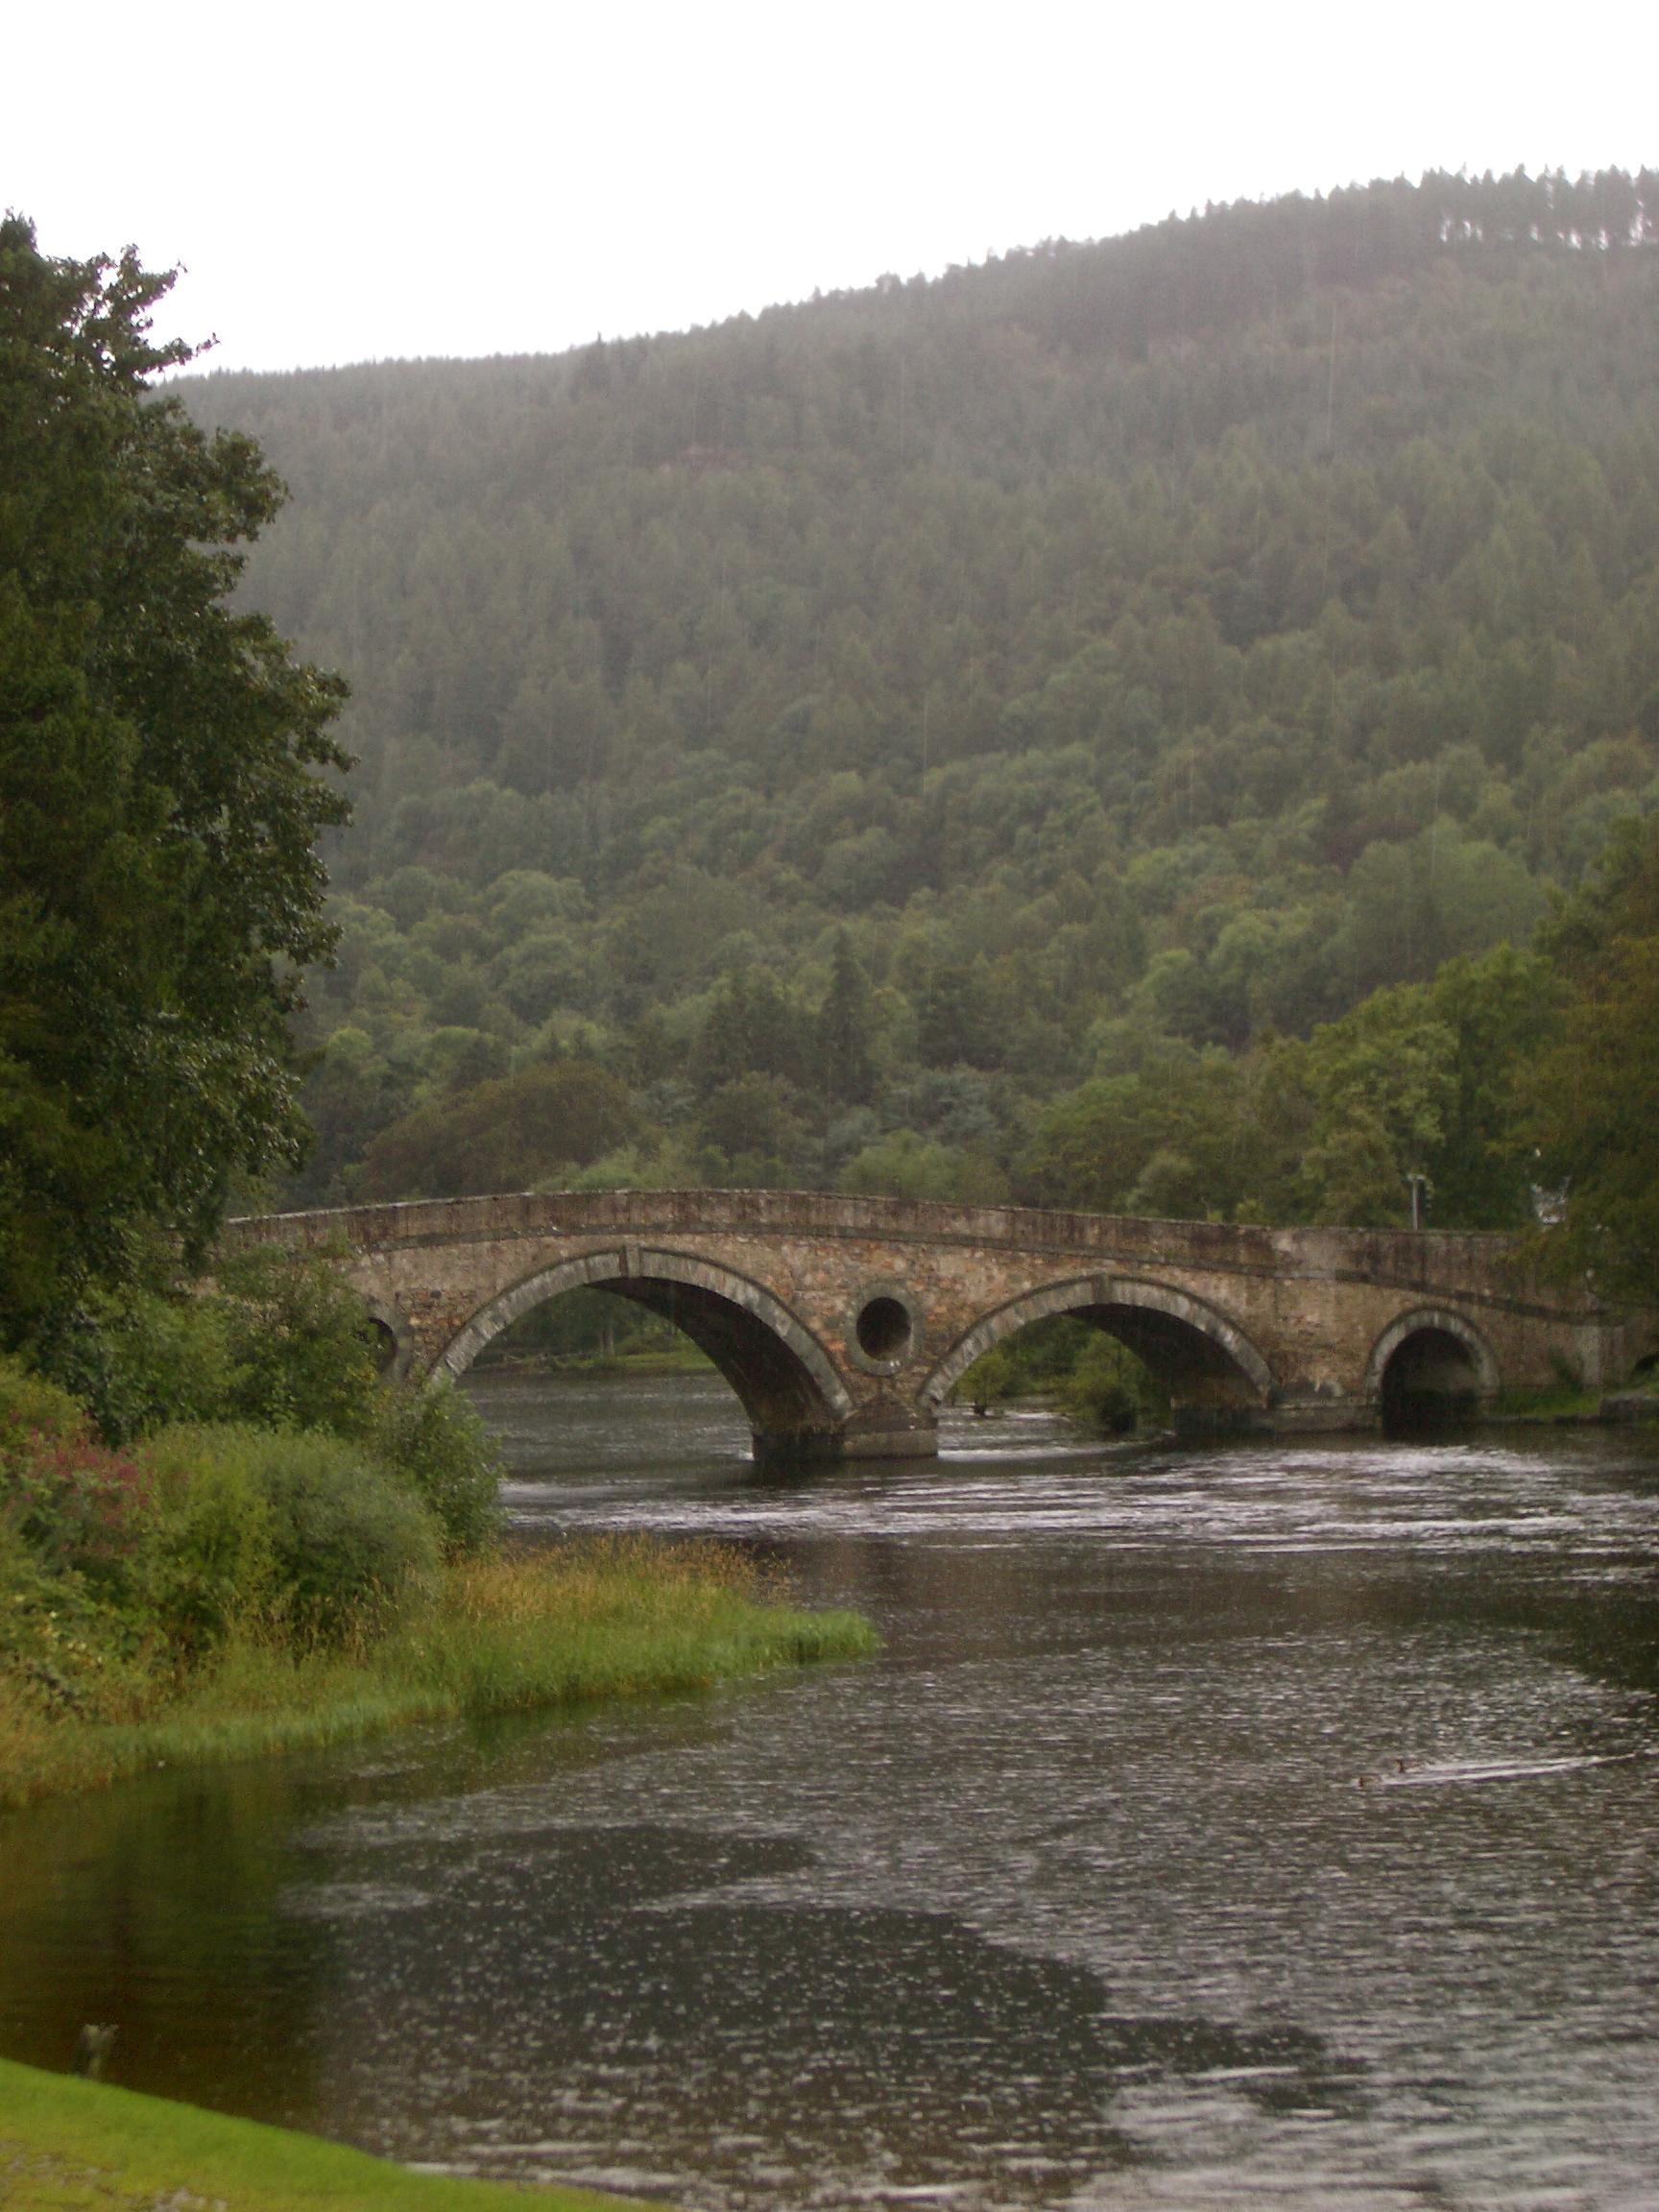 Bridge over Loch Tay